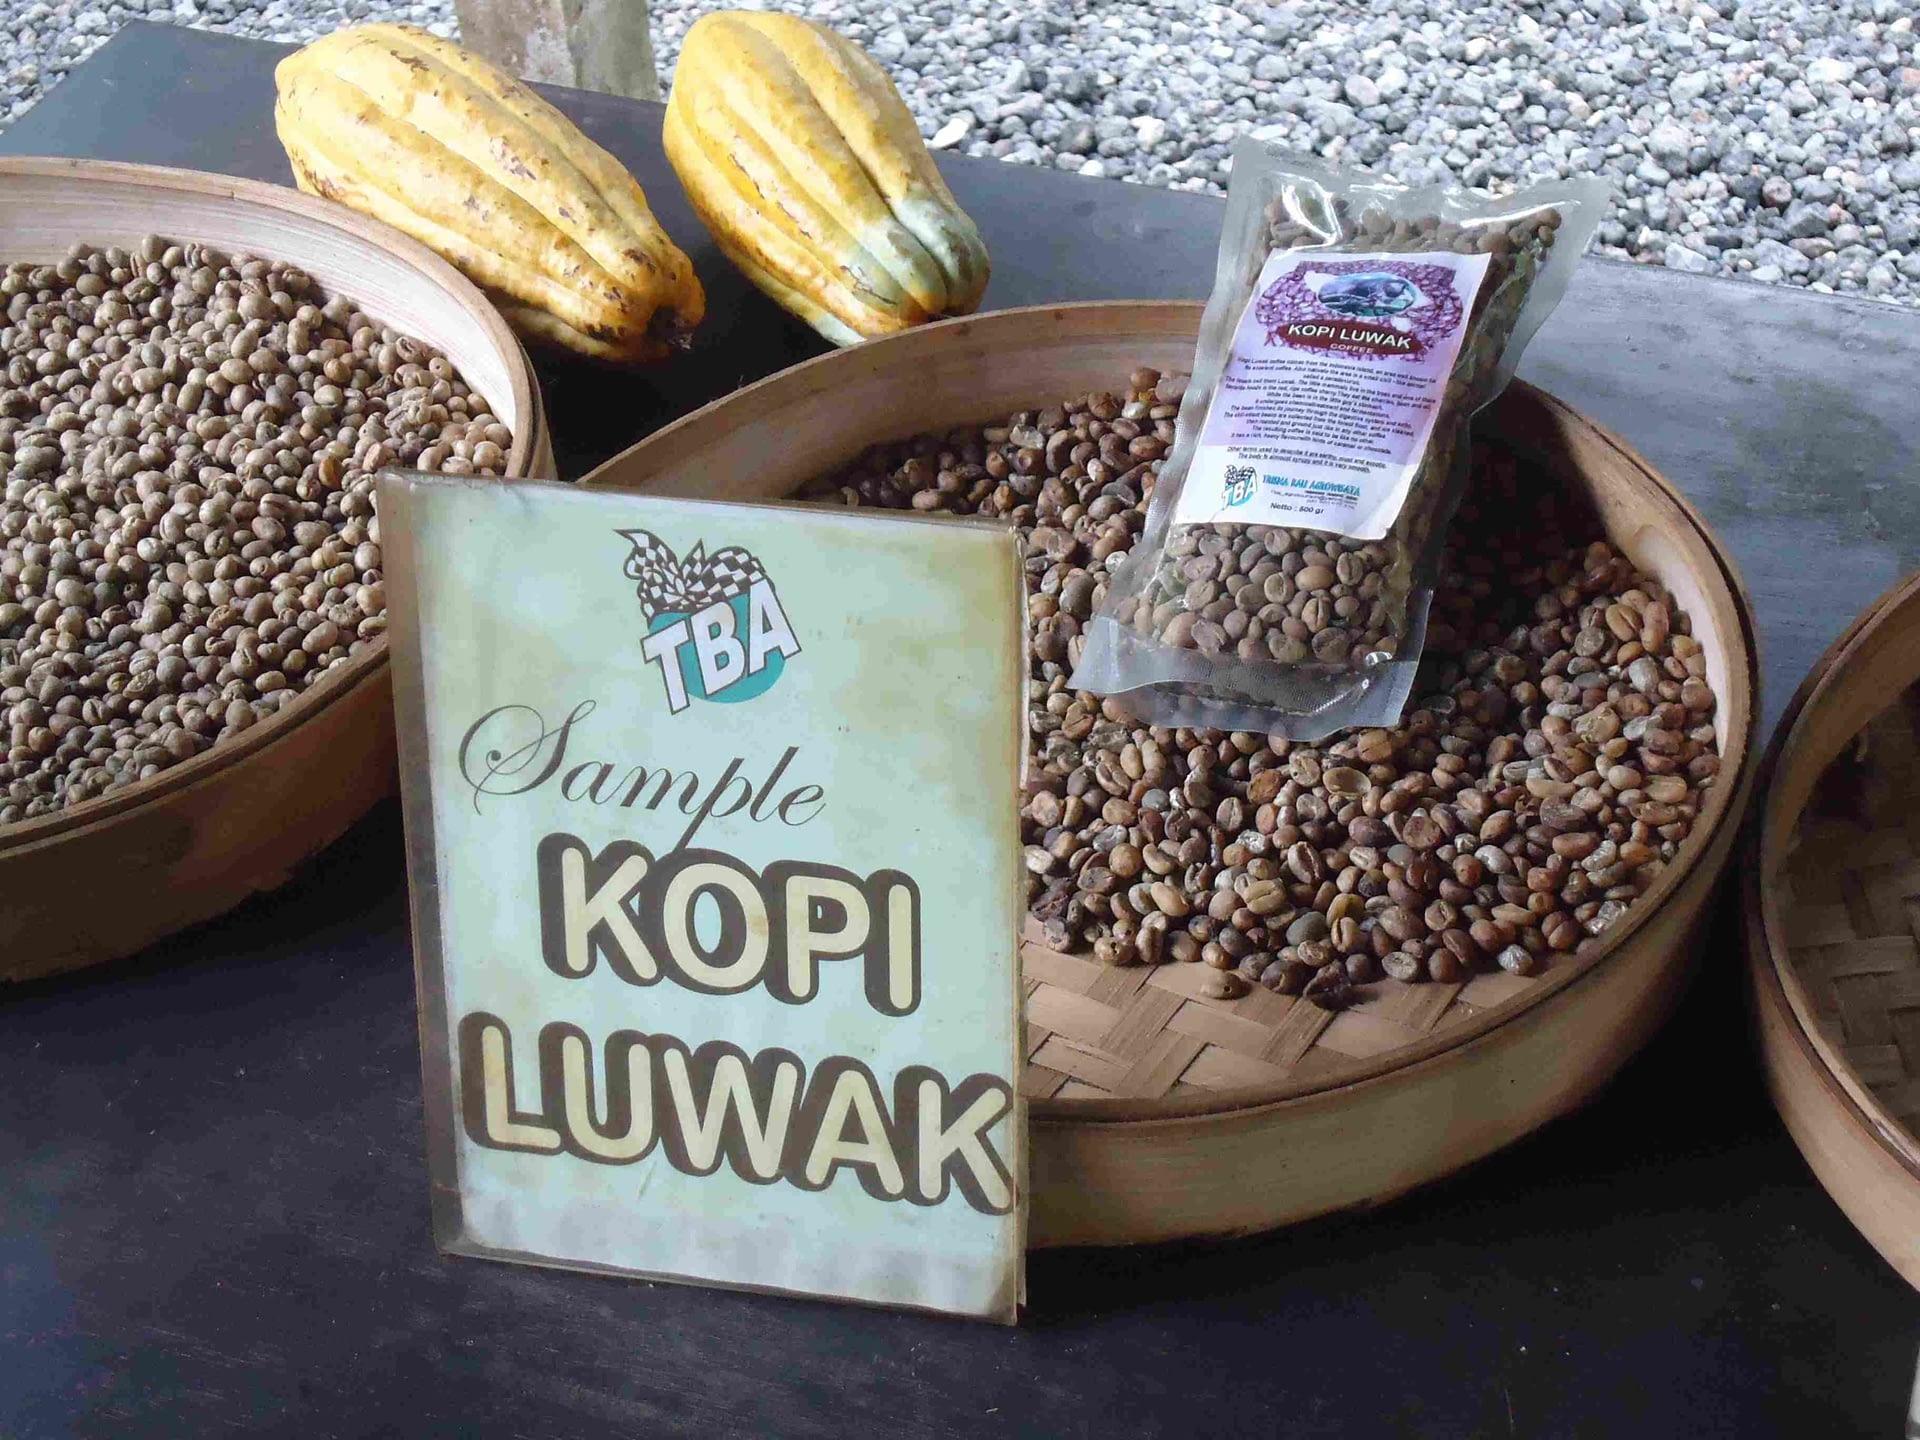 mon cher cafe mangouste kopi luwak